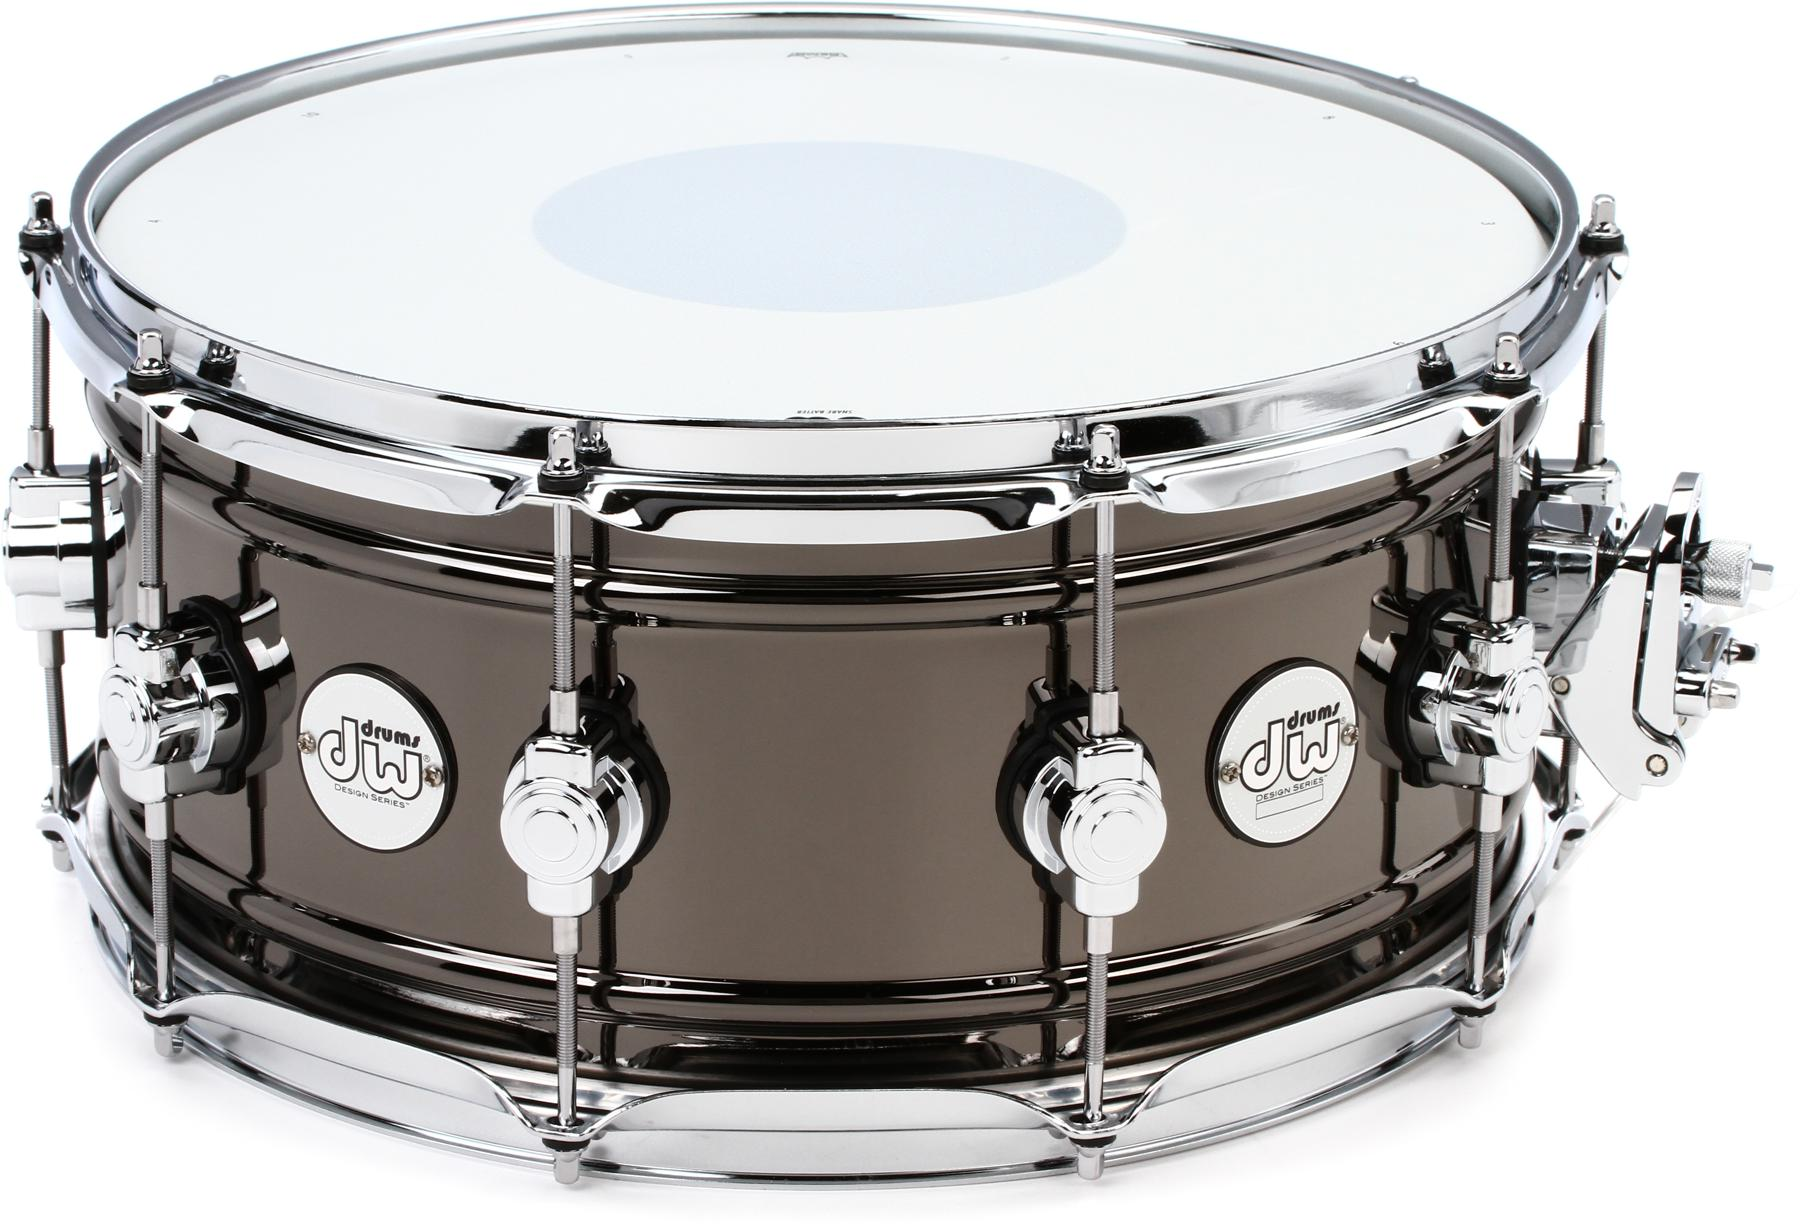 2. DW Design Series Black Nickel over Brass Snare 14 x 6.5 in